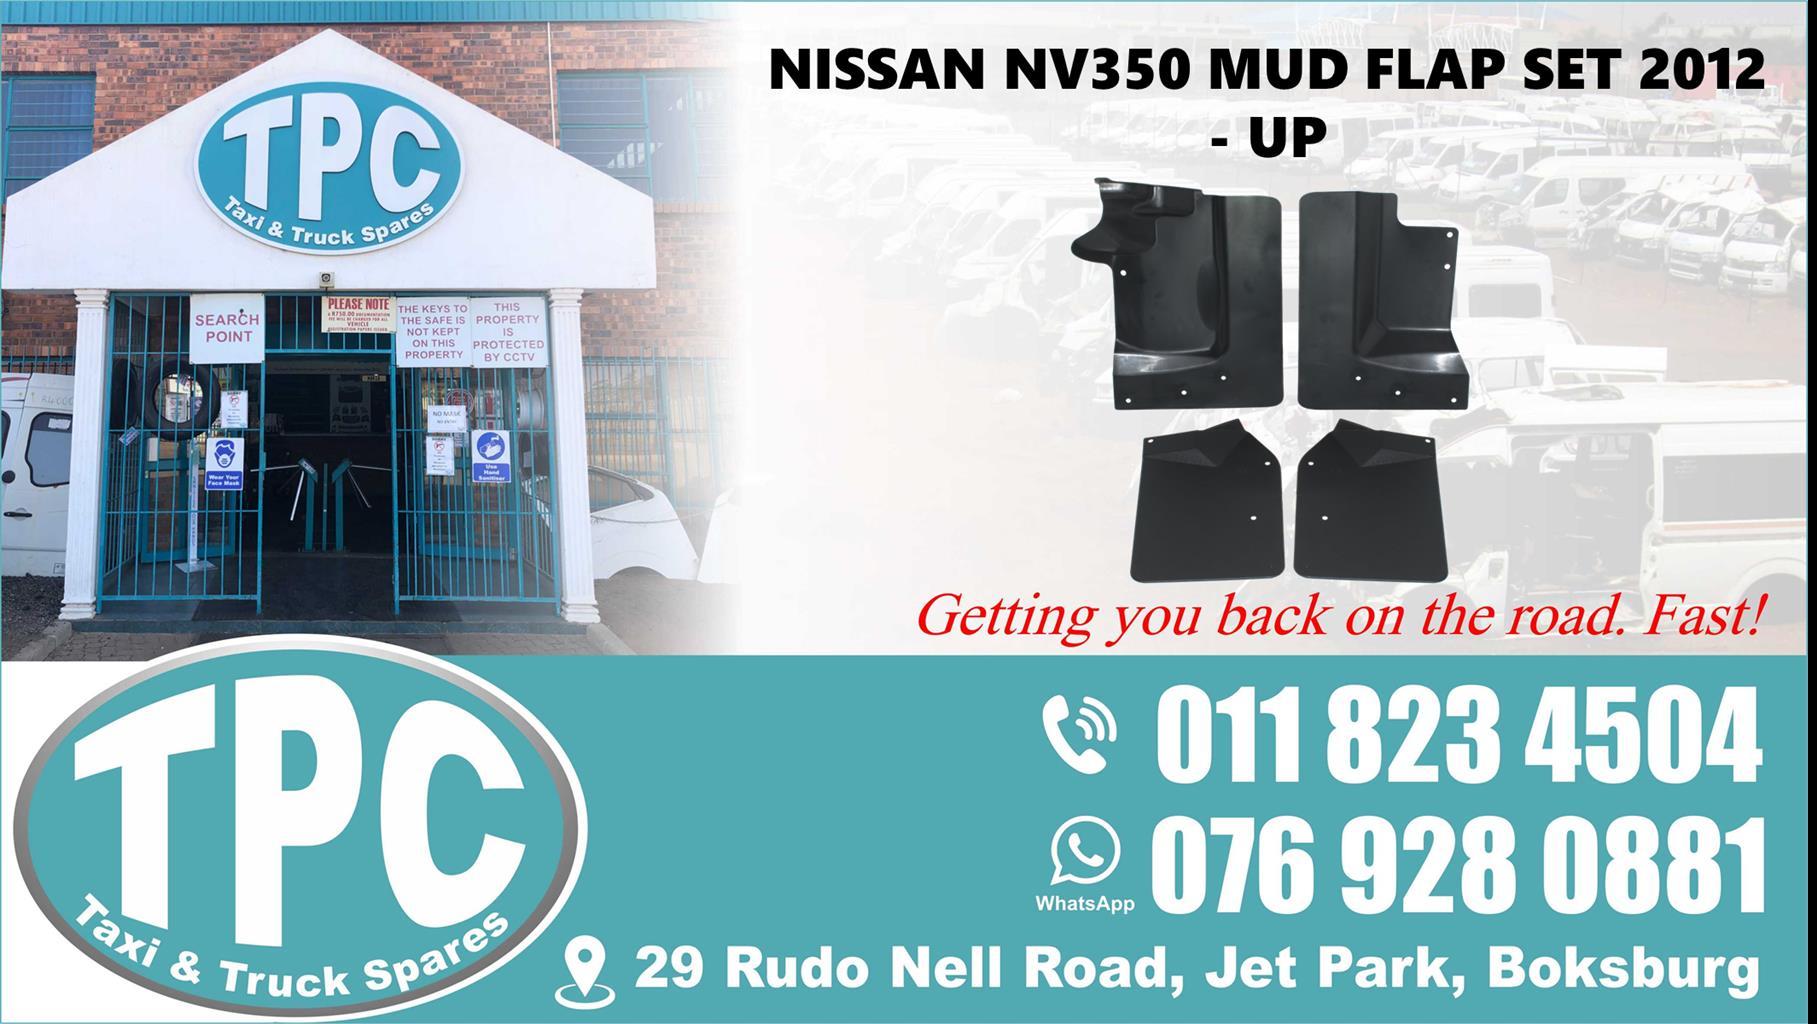 Nissan NV350 Mud Flap Set 2012 - Up - For Sale at TPC